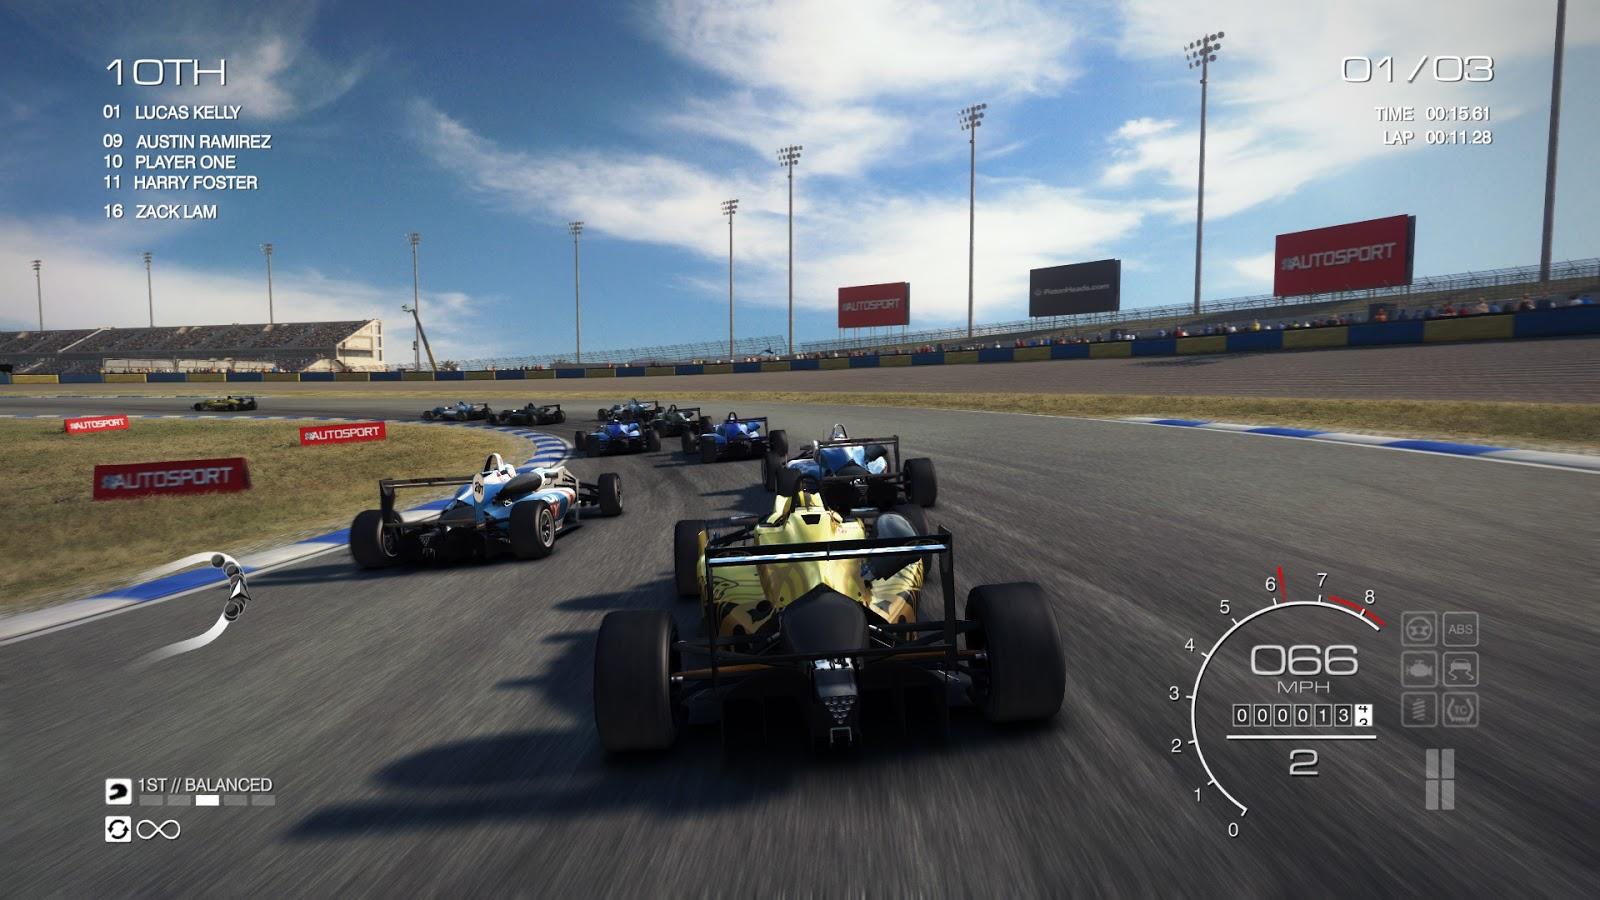 ⭐ Grid autosport pc download free | GRID Autosport Free